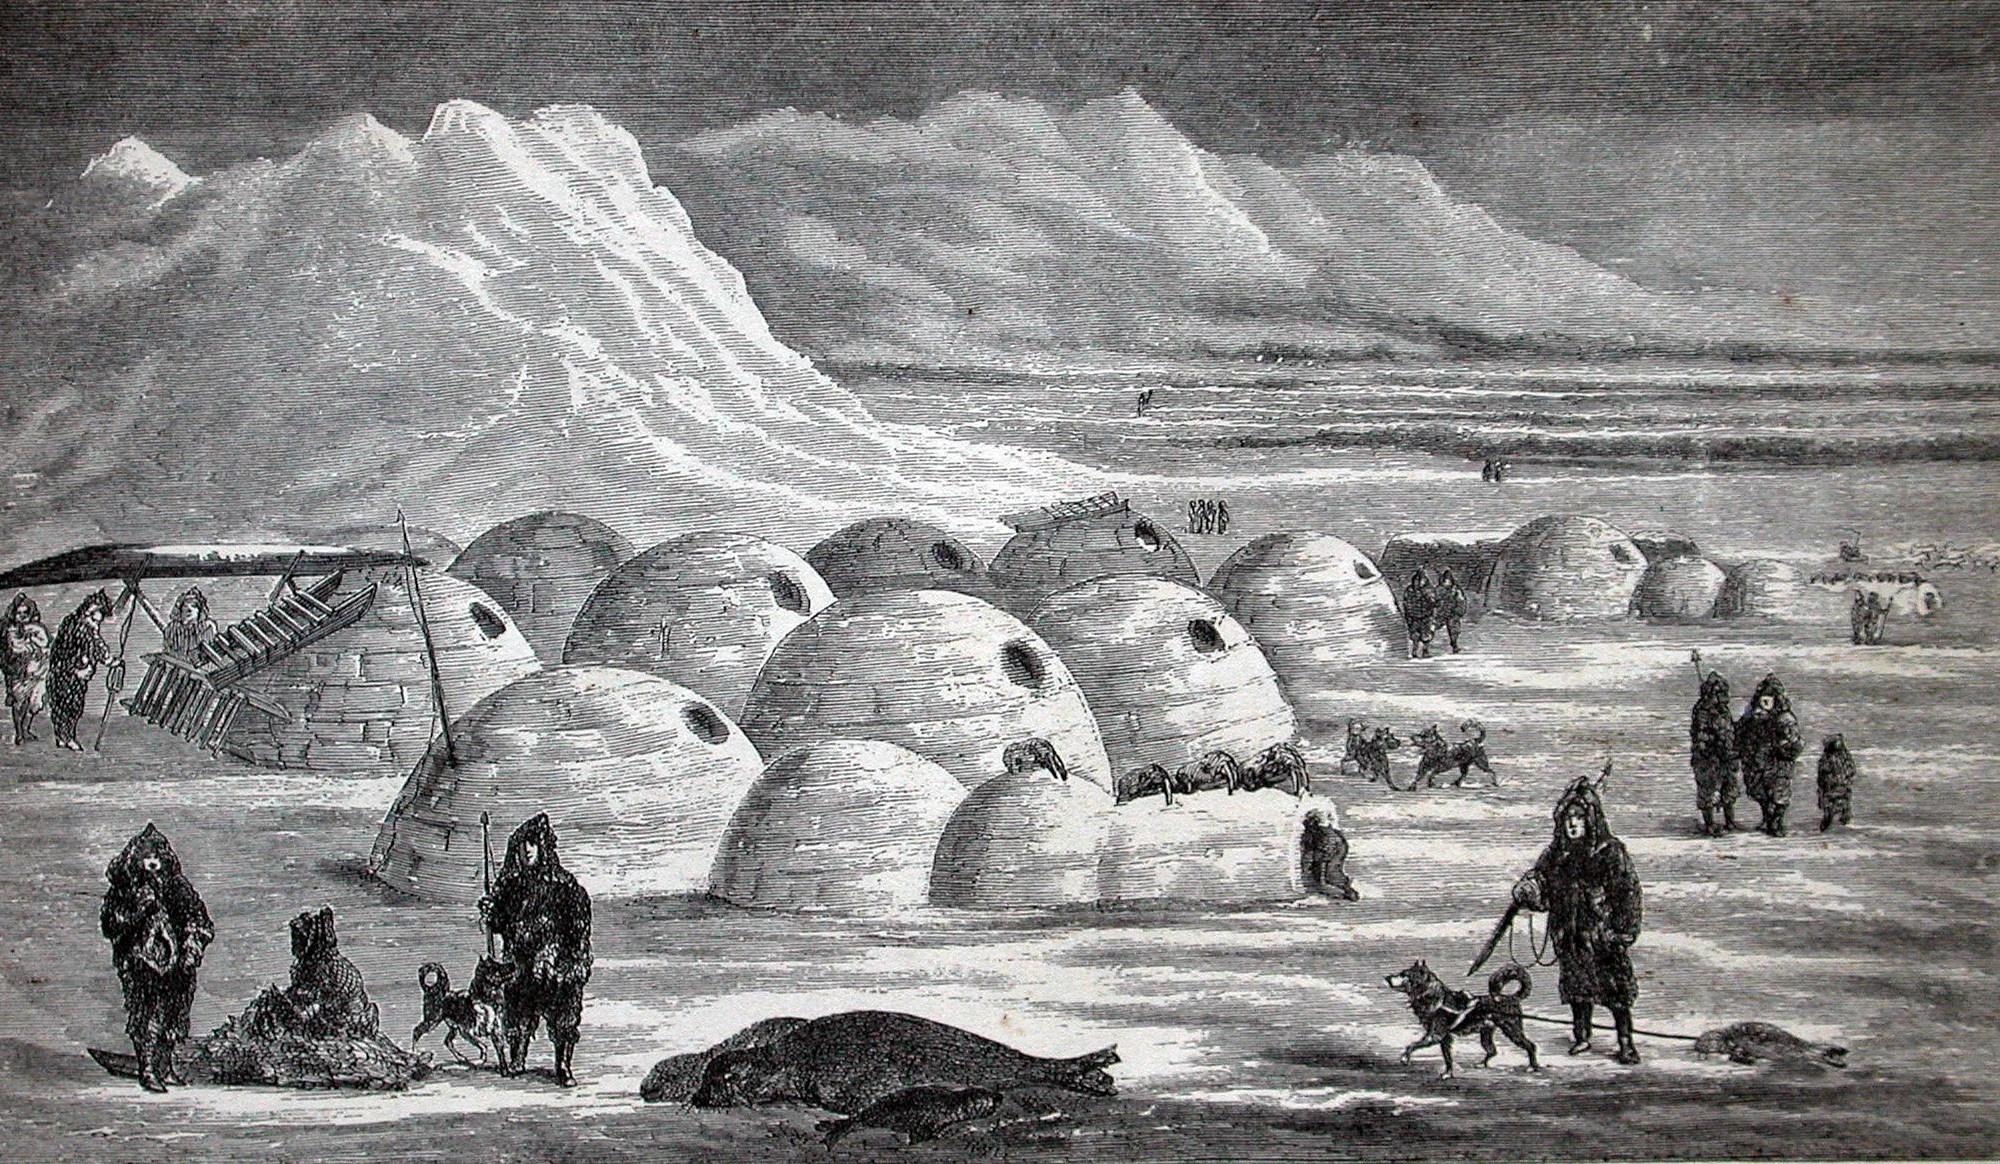 Baharian villages